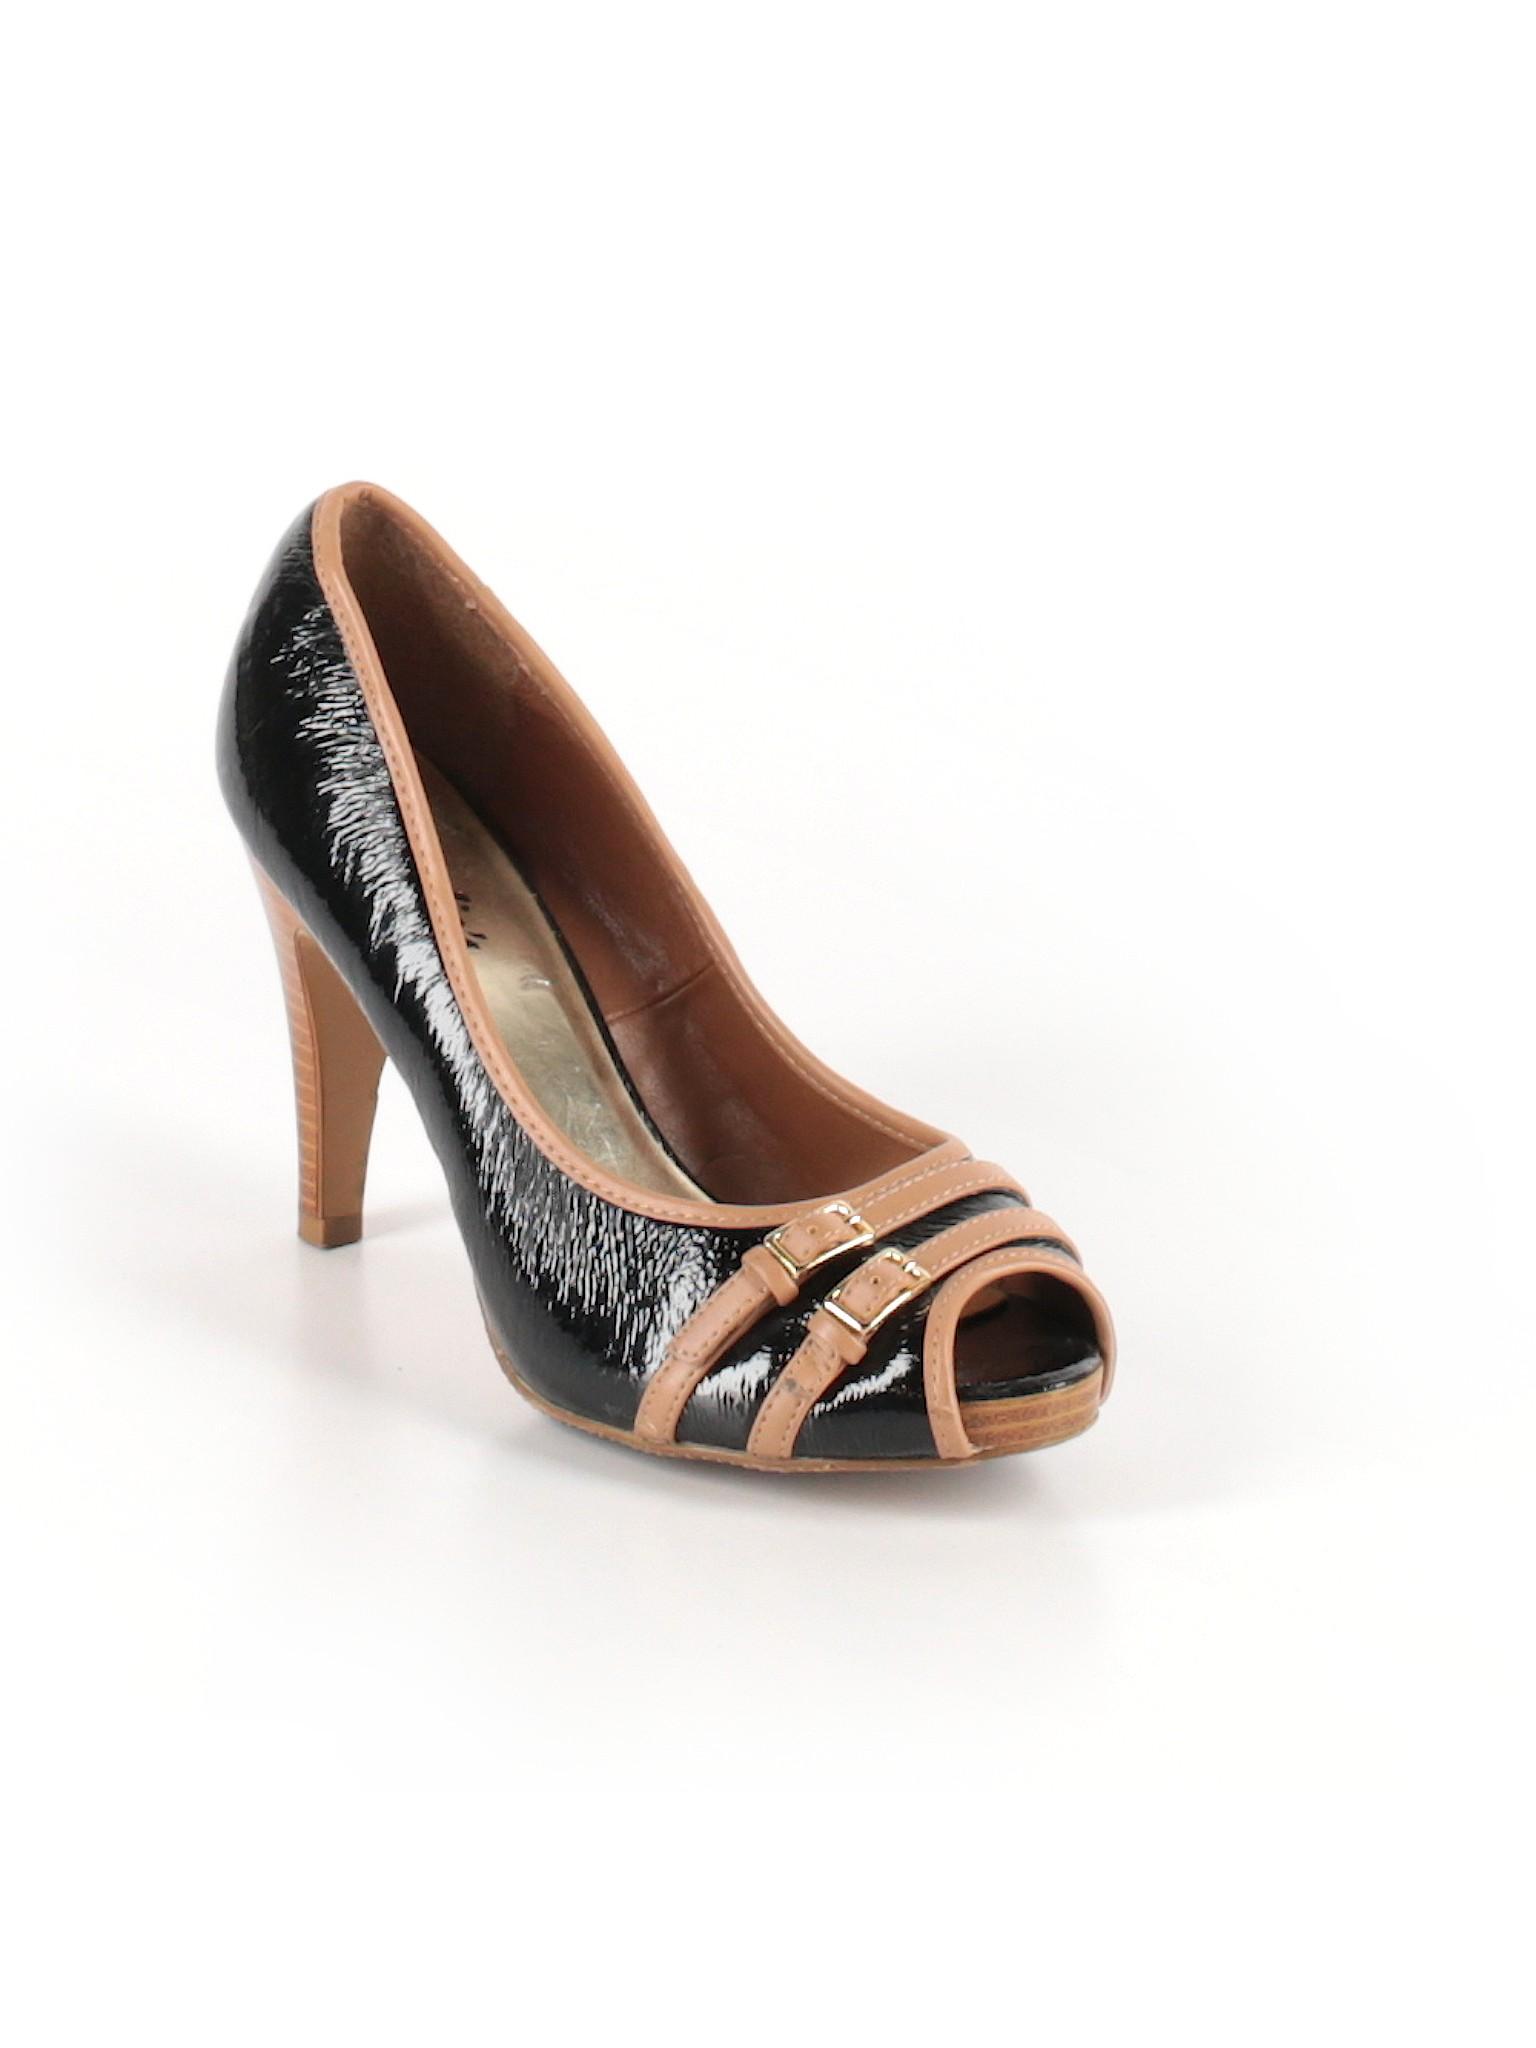 promotion promotion Heels Boutique Heels Boutique Candie's Boutique Candie's CgAXqxwn